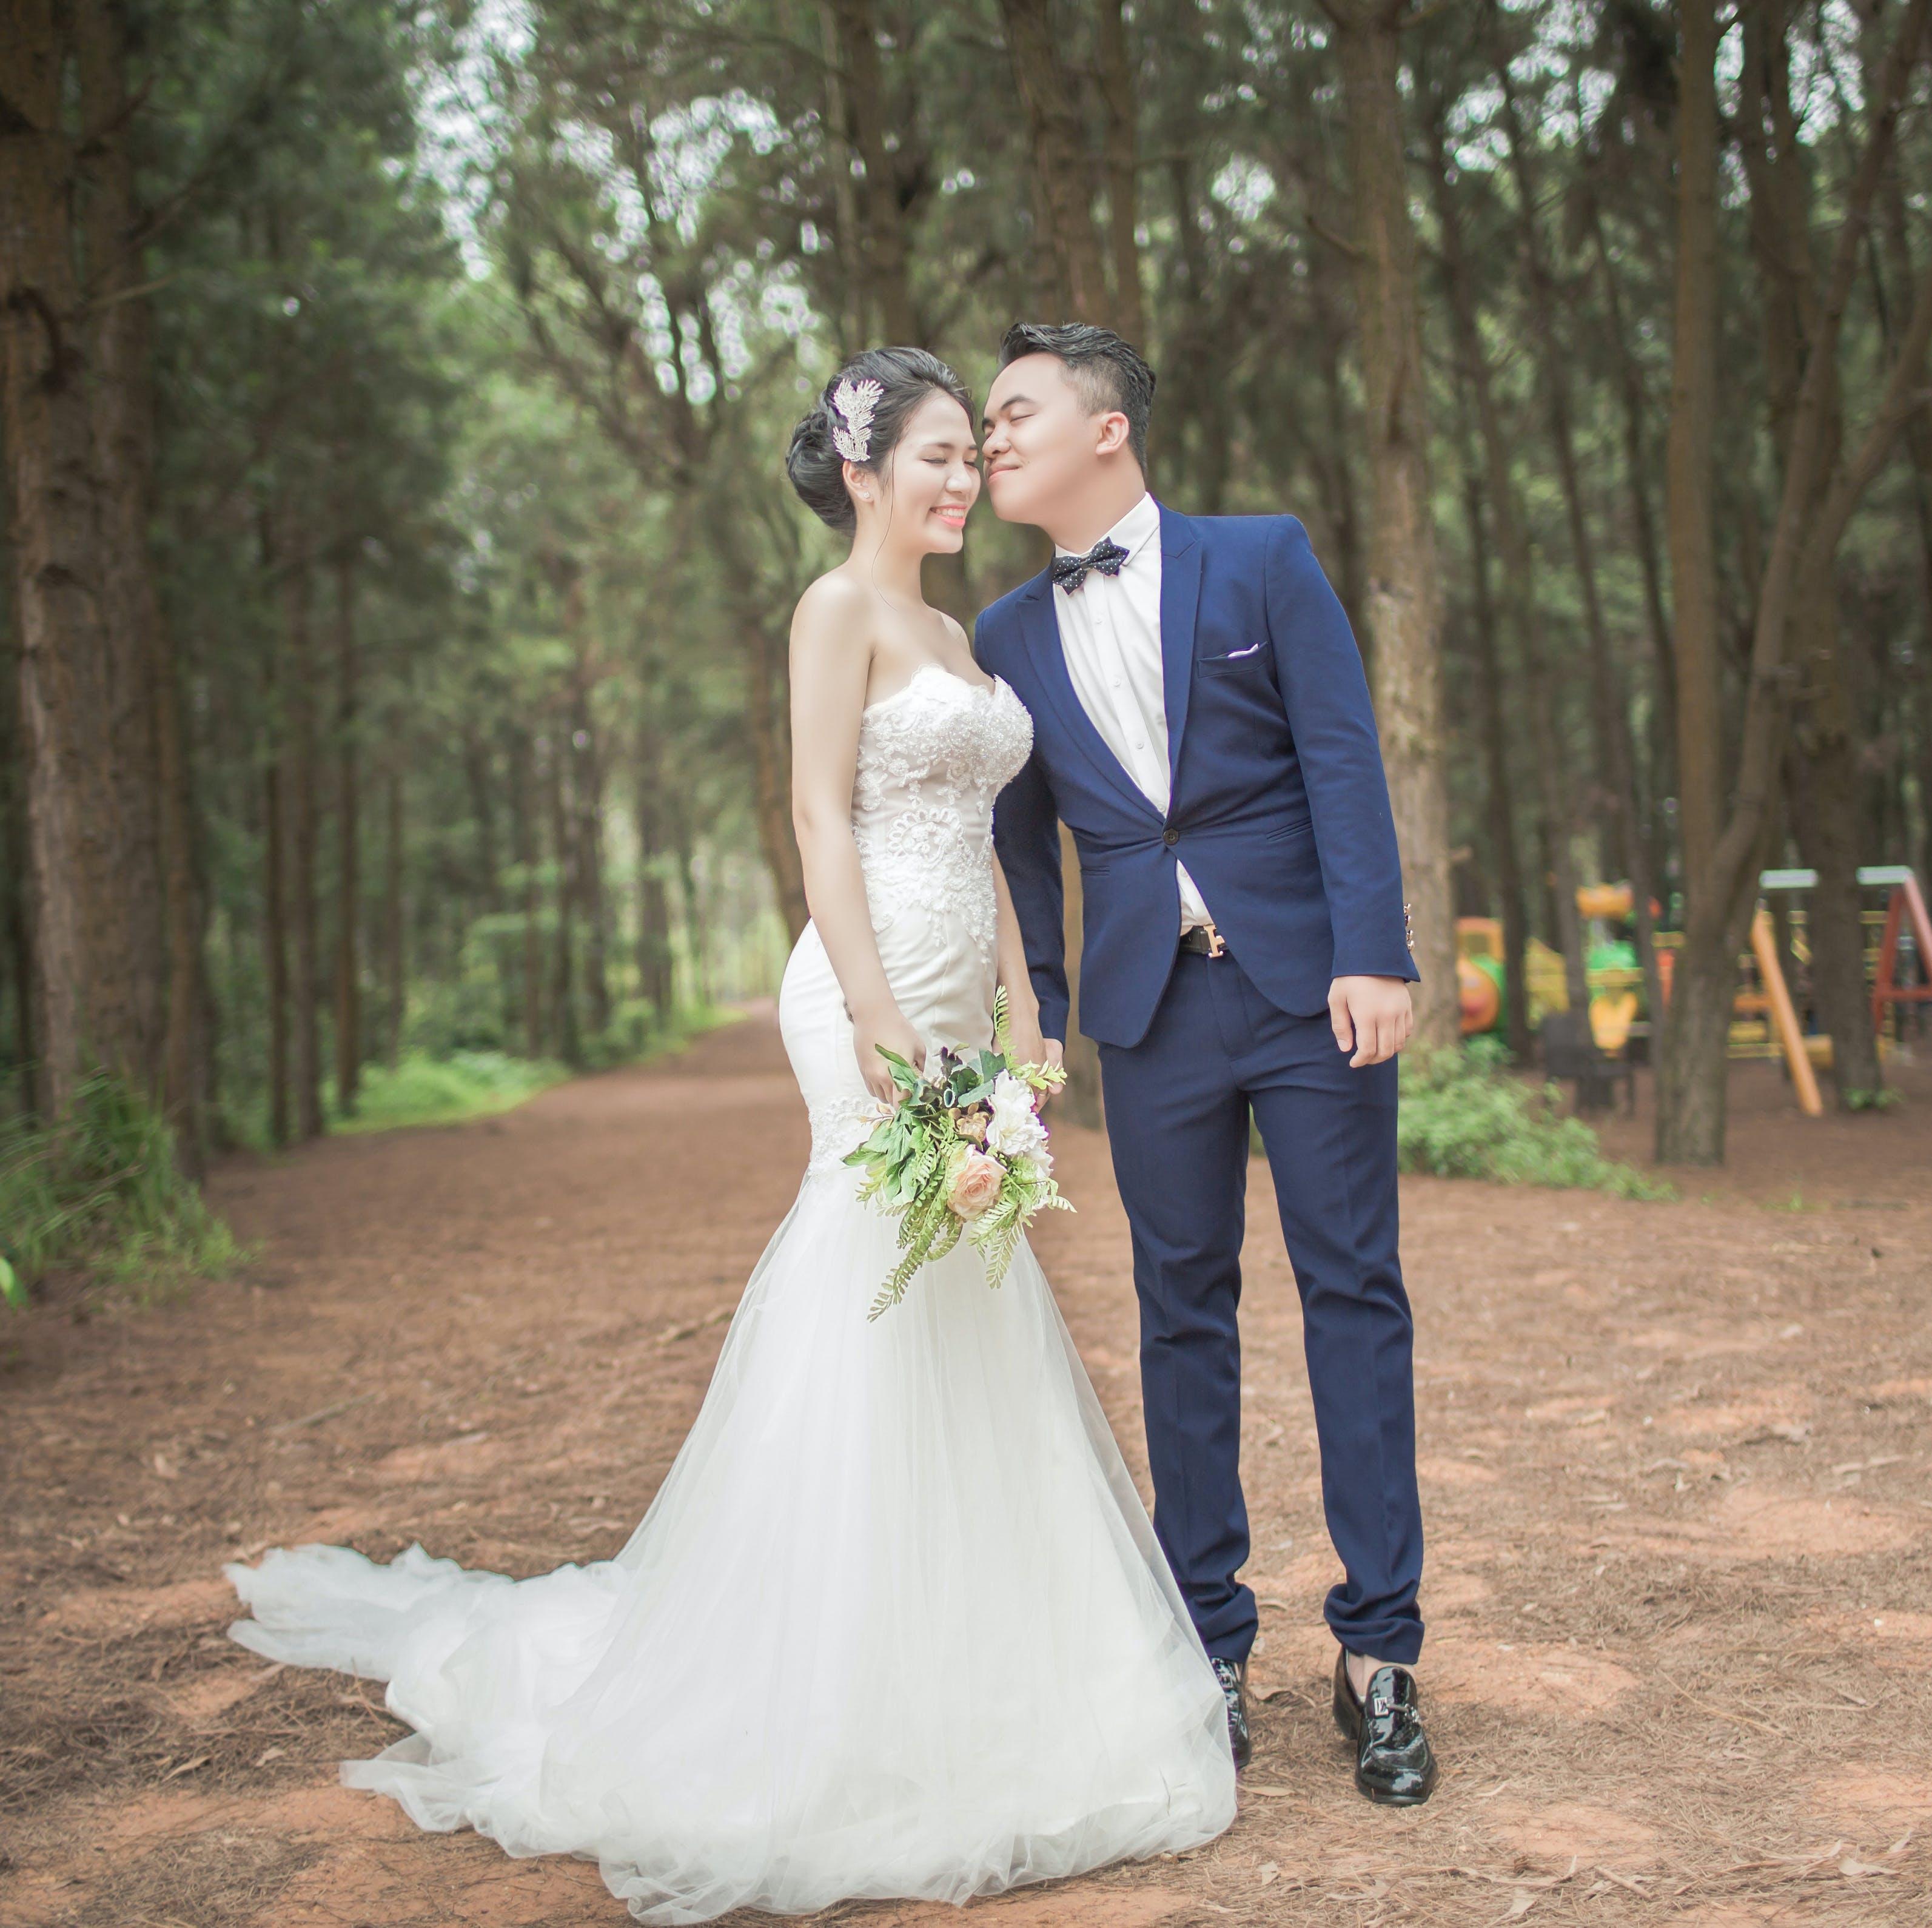 Bride and Groom Standing Between Trees